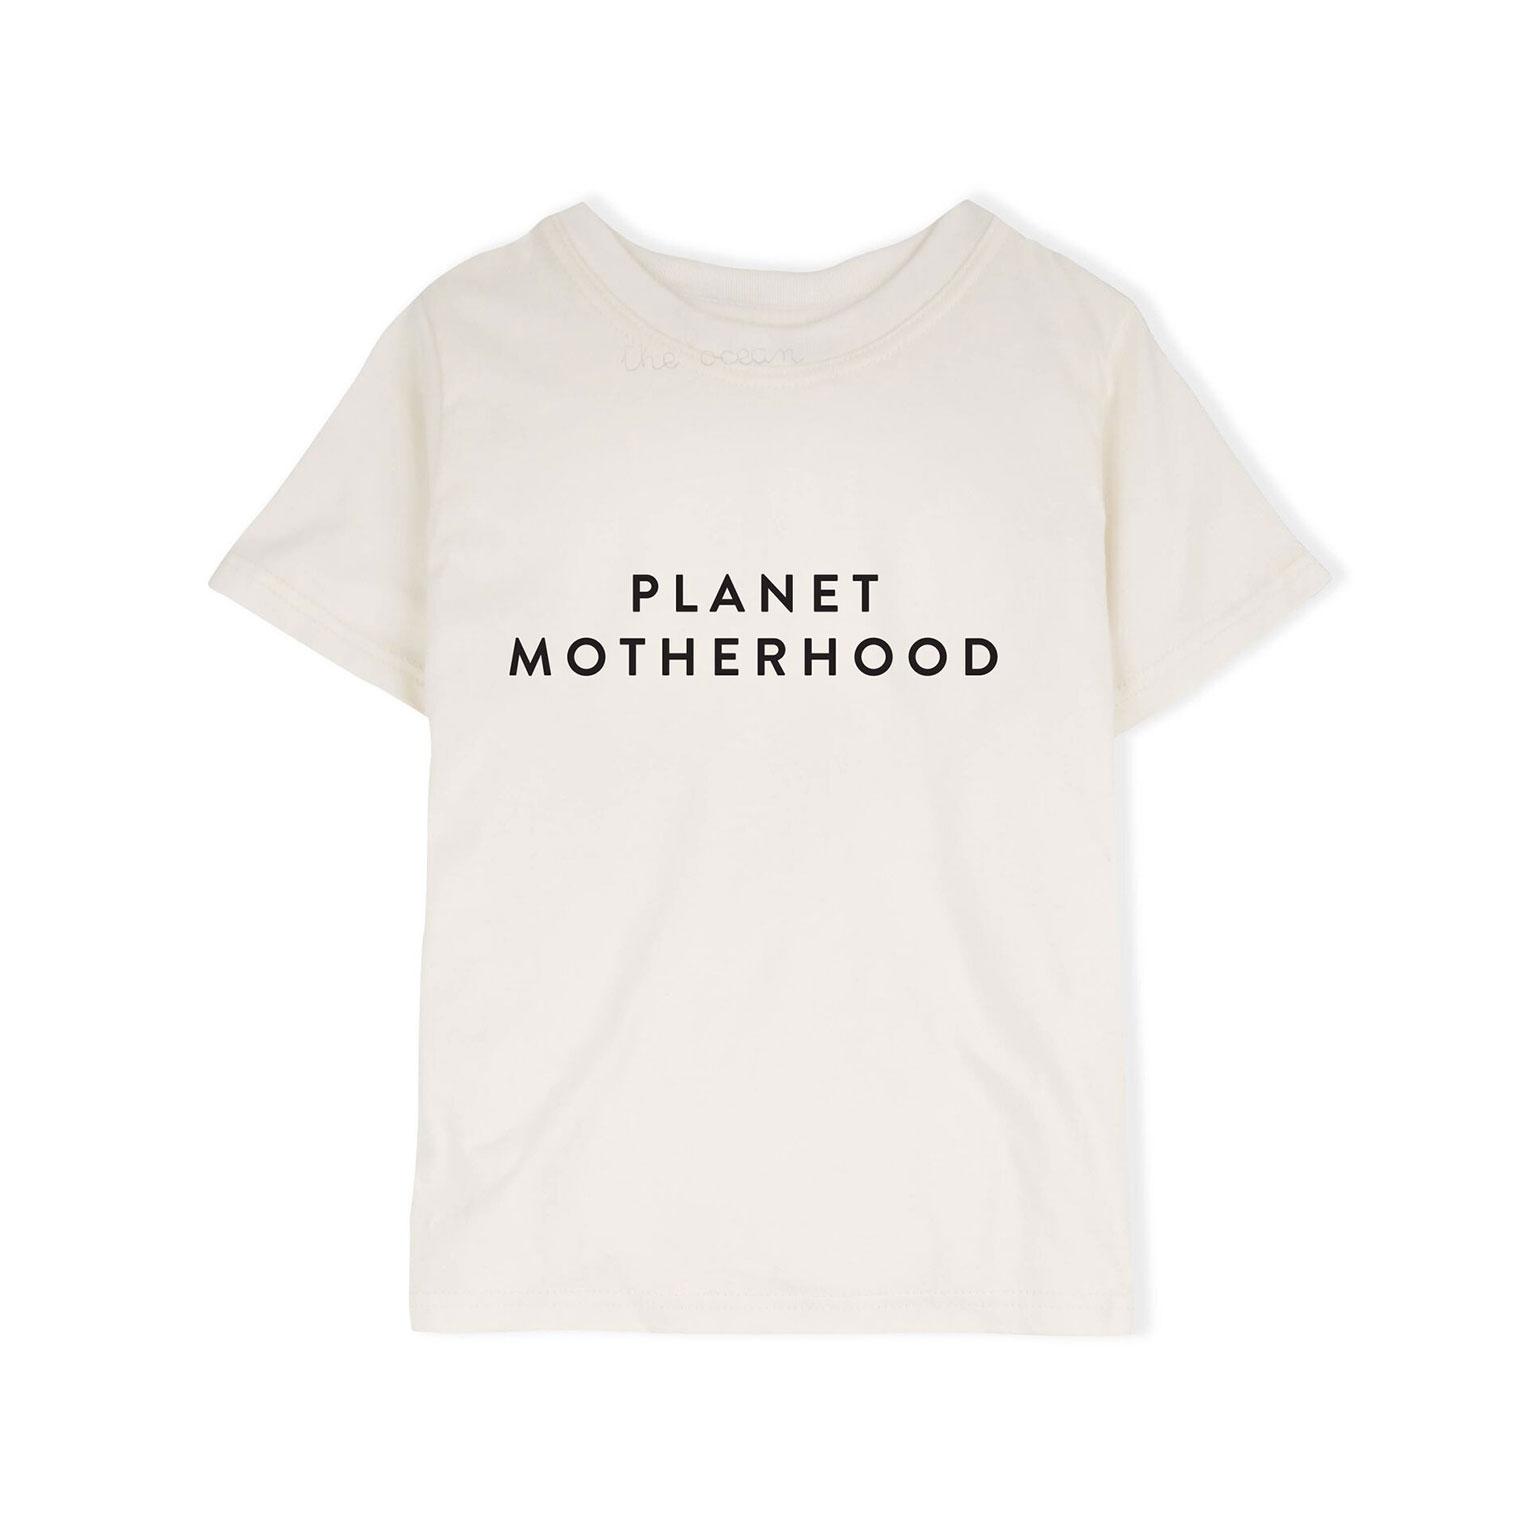 planet motherhood little loved ones